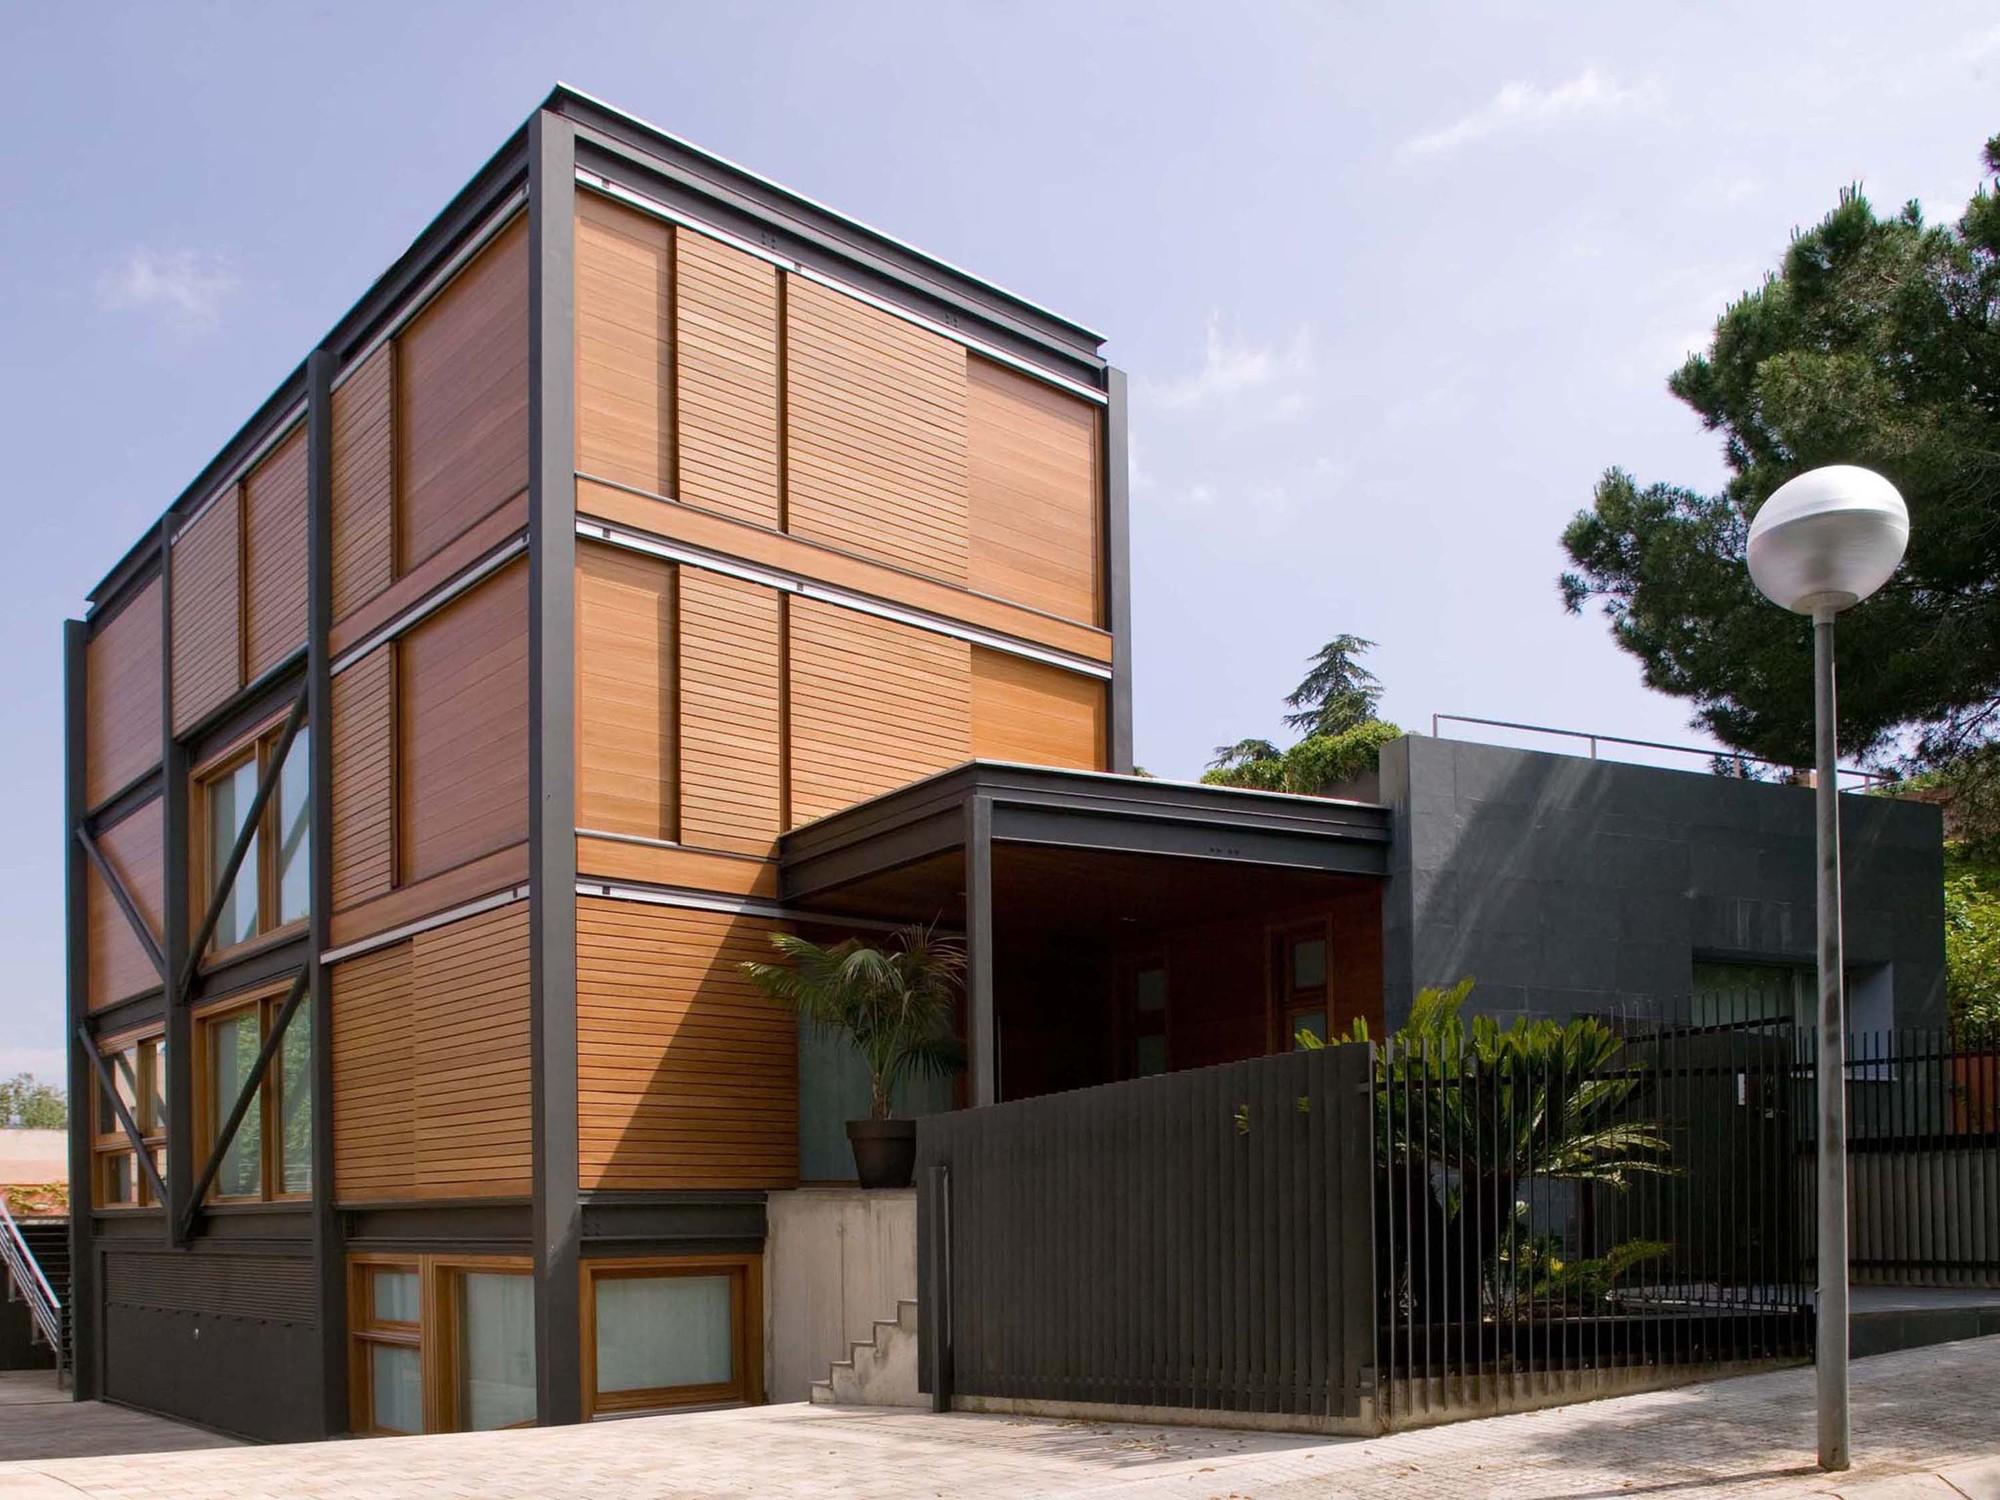 P house artigas arquitectes archdaily - Sans arquitectes ...